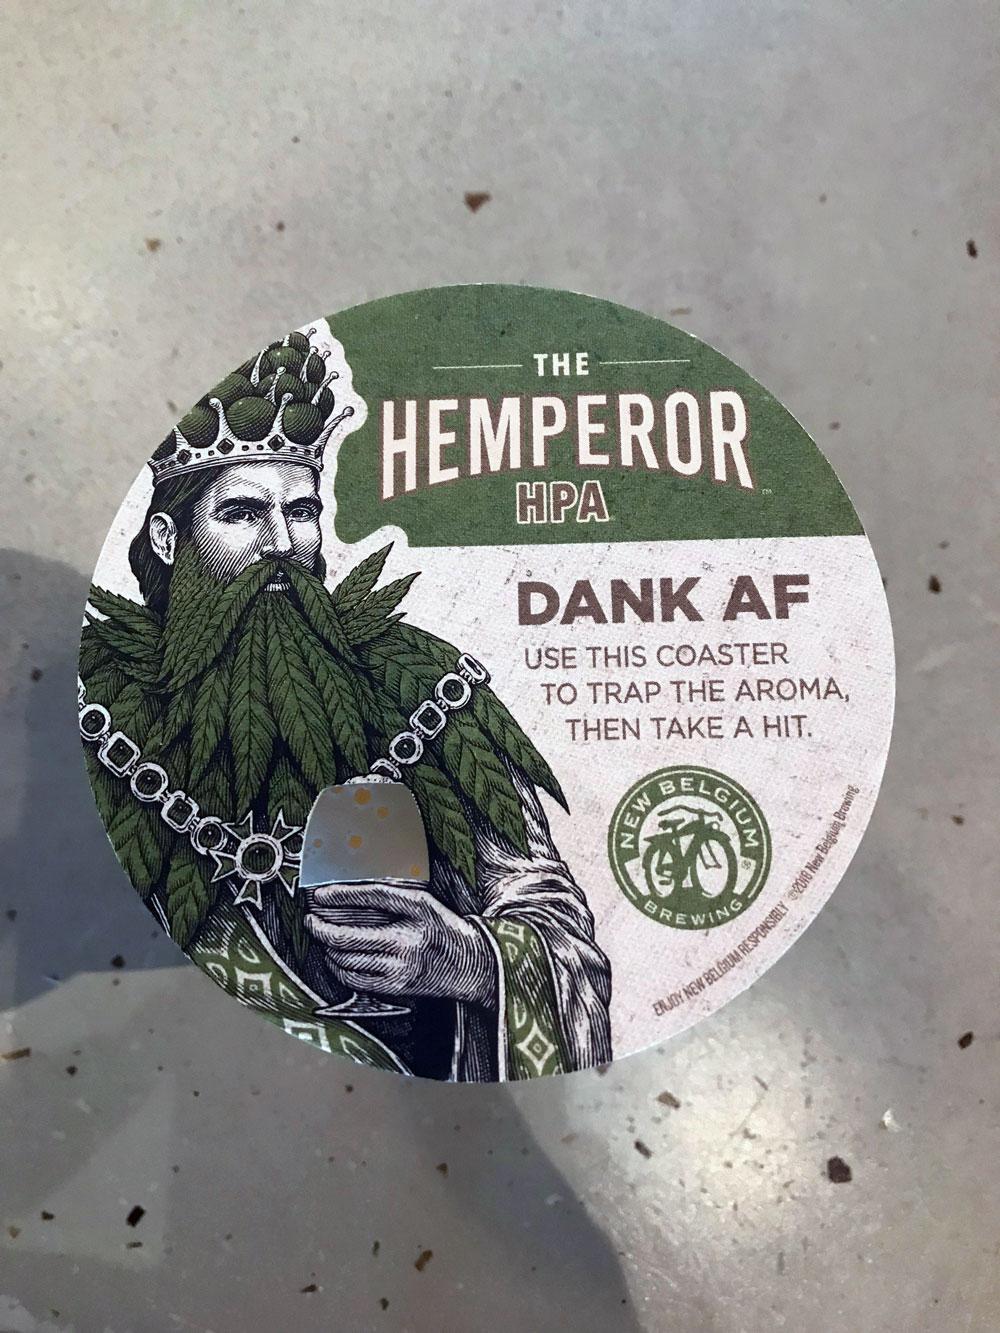 Hemperor coaster from New Belgium Brewing Co.